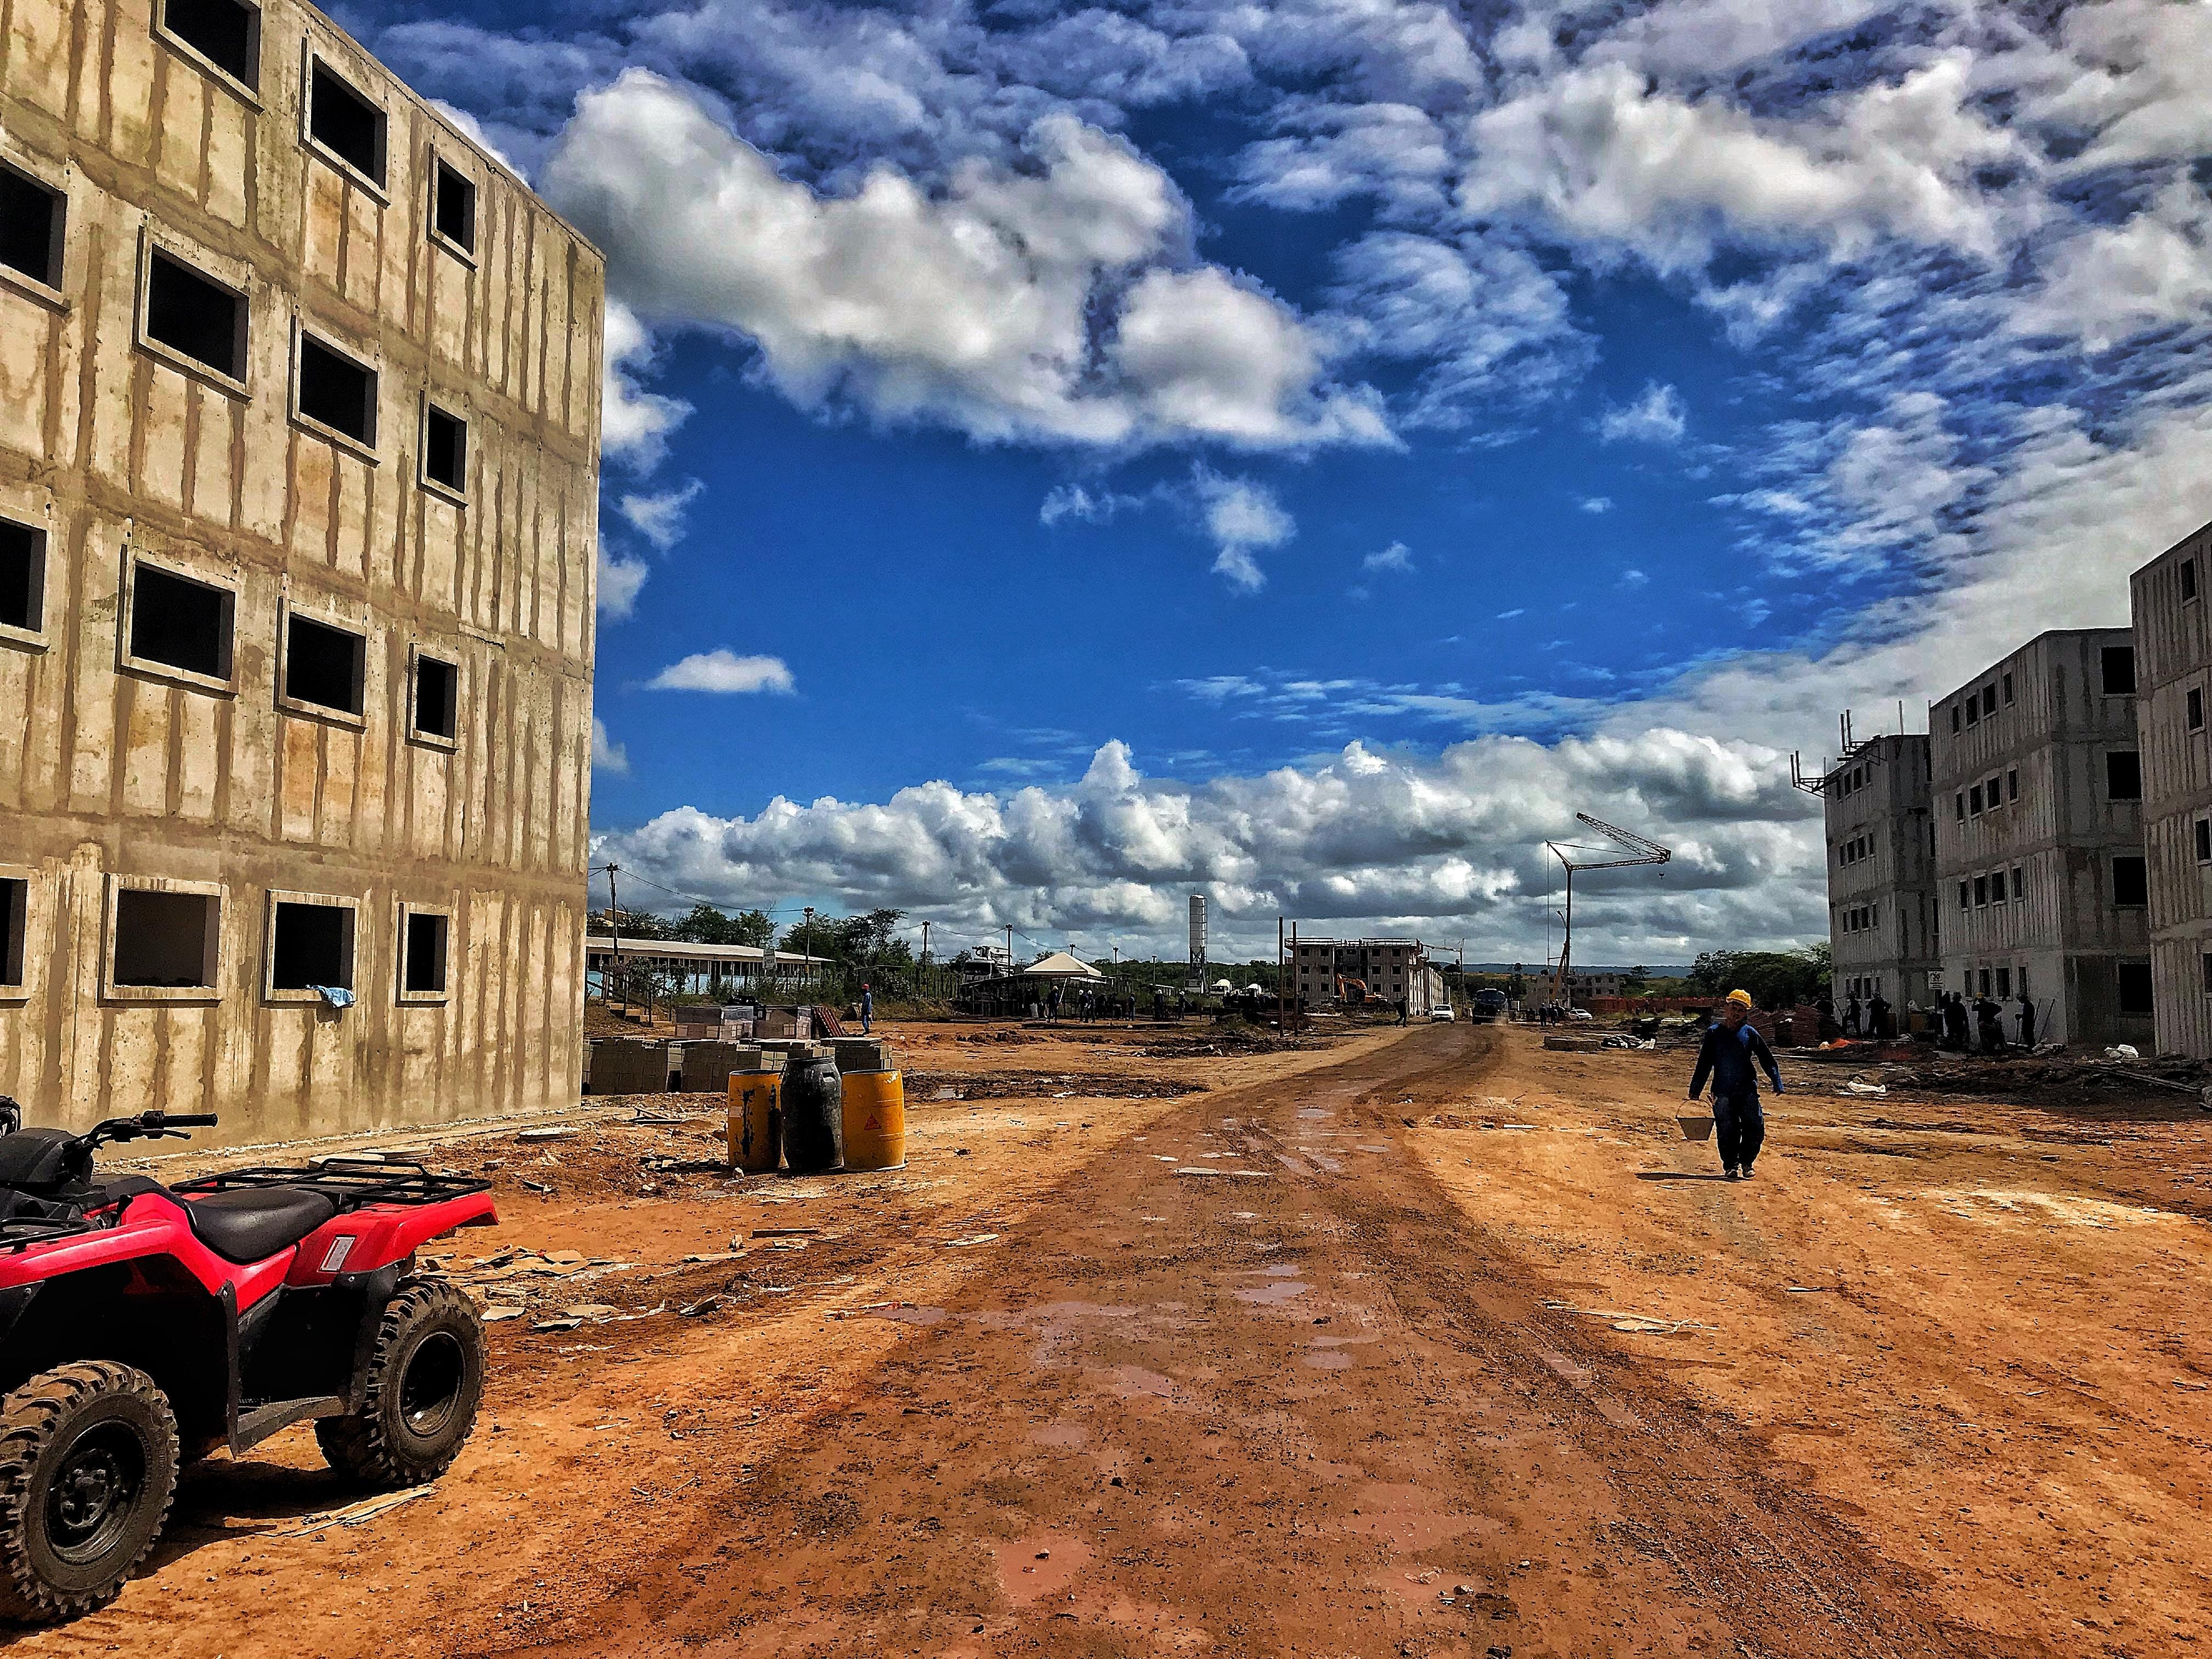 red ATV near building